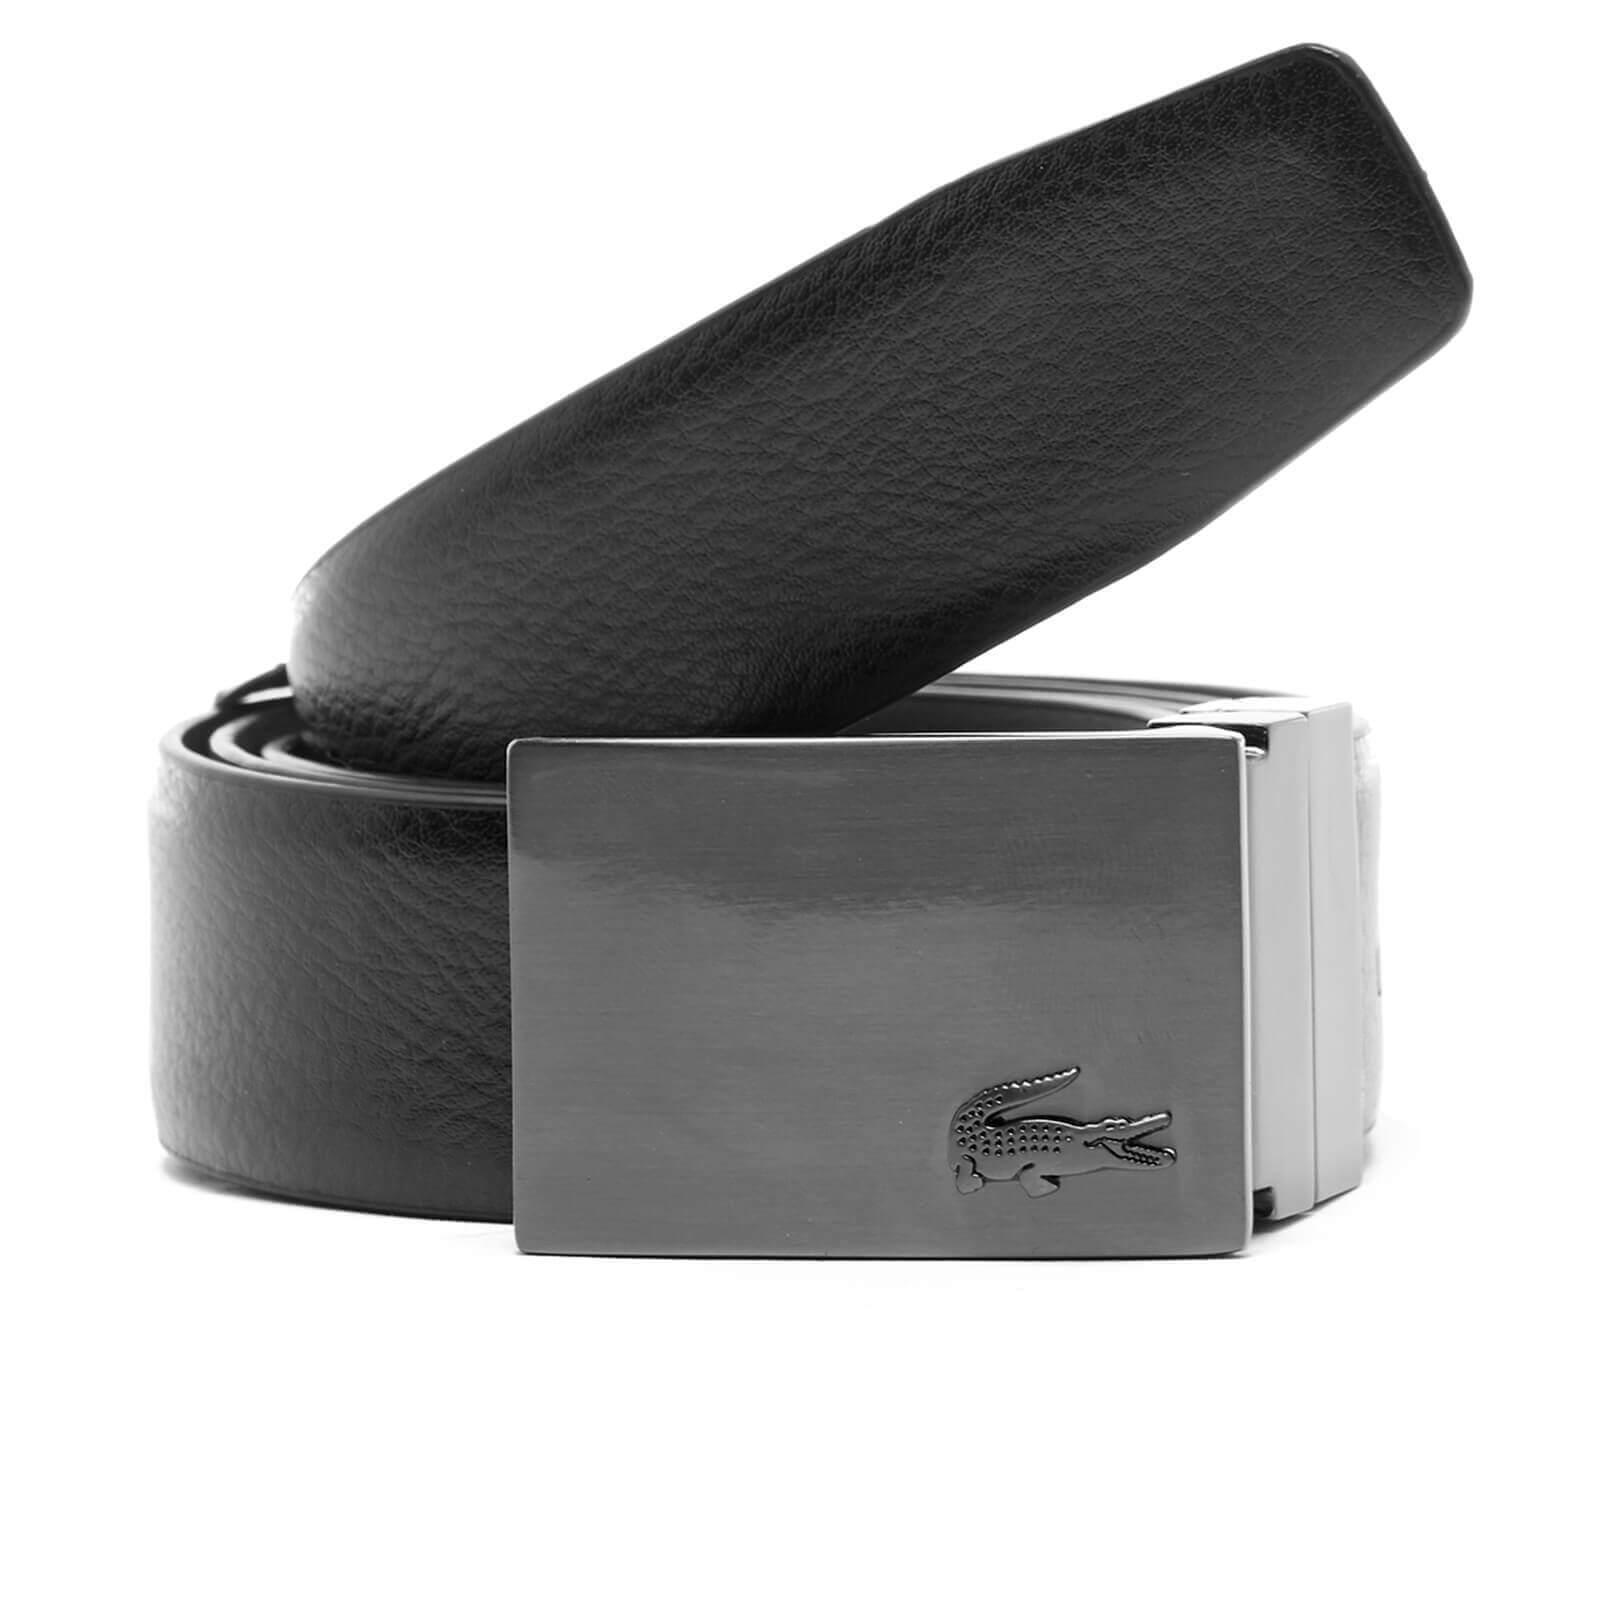 383c9a92cd Lacoste Men's Reversible Branded Buckle Belt - Brown/Black - Free UK  Delivery over £50